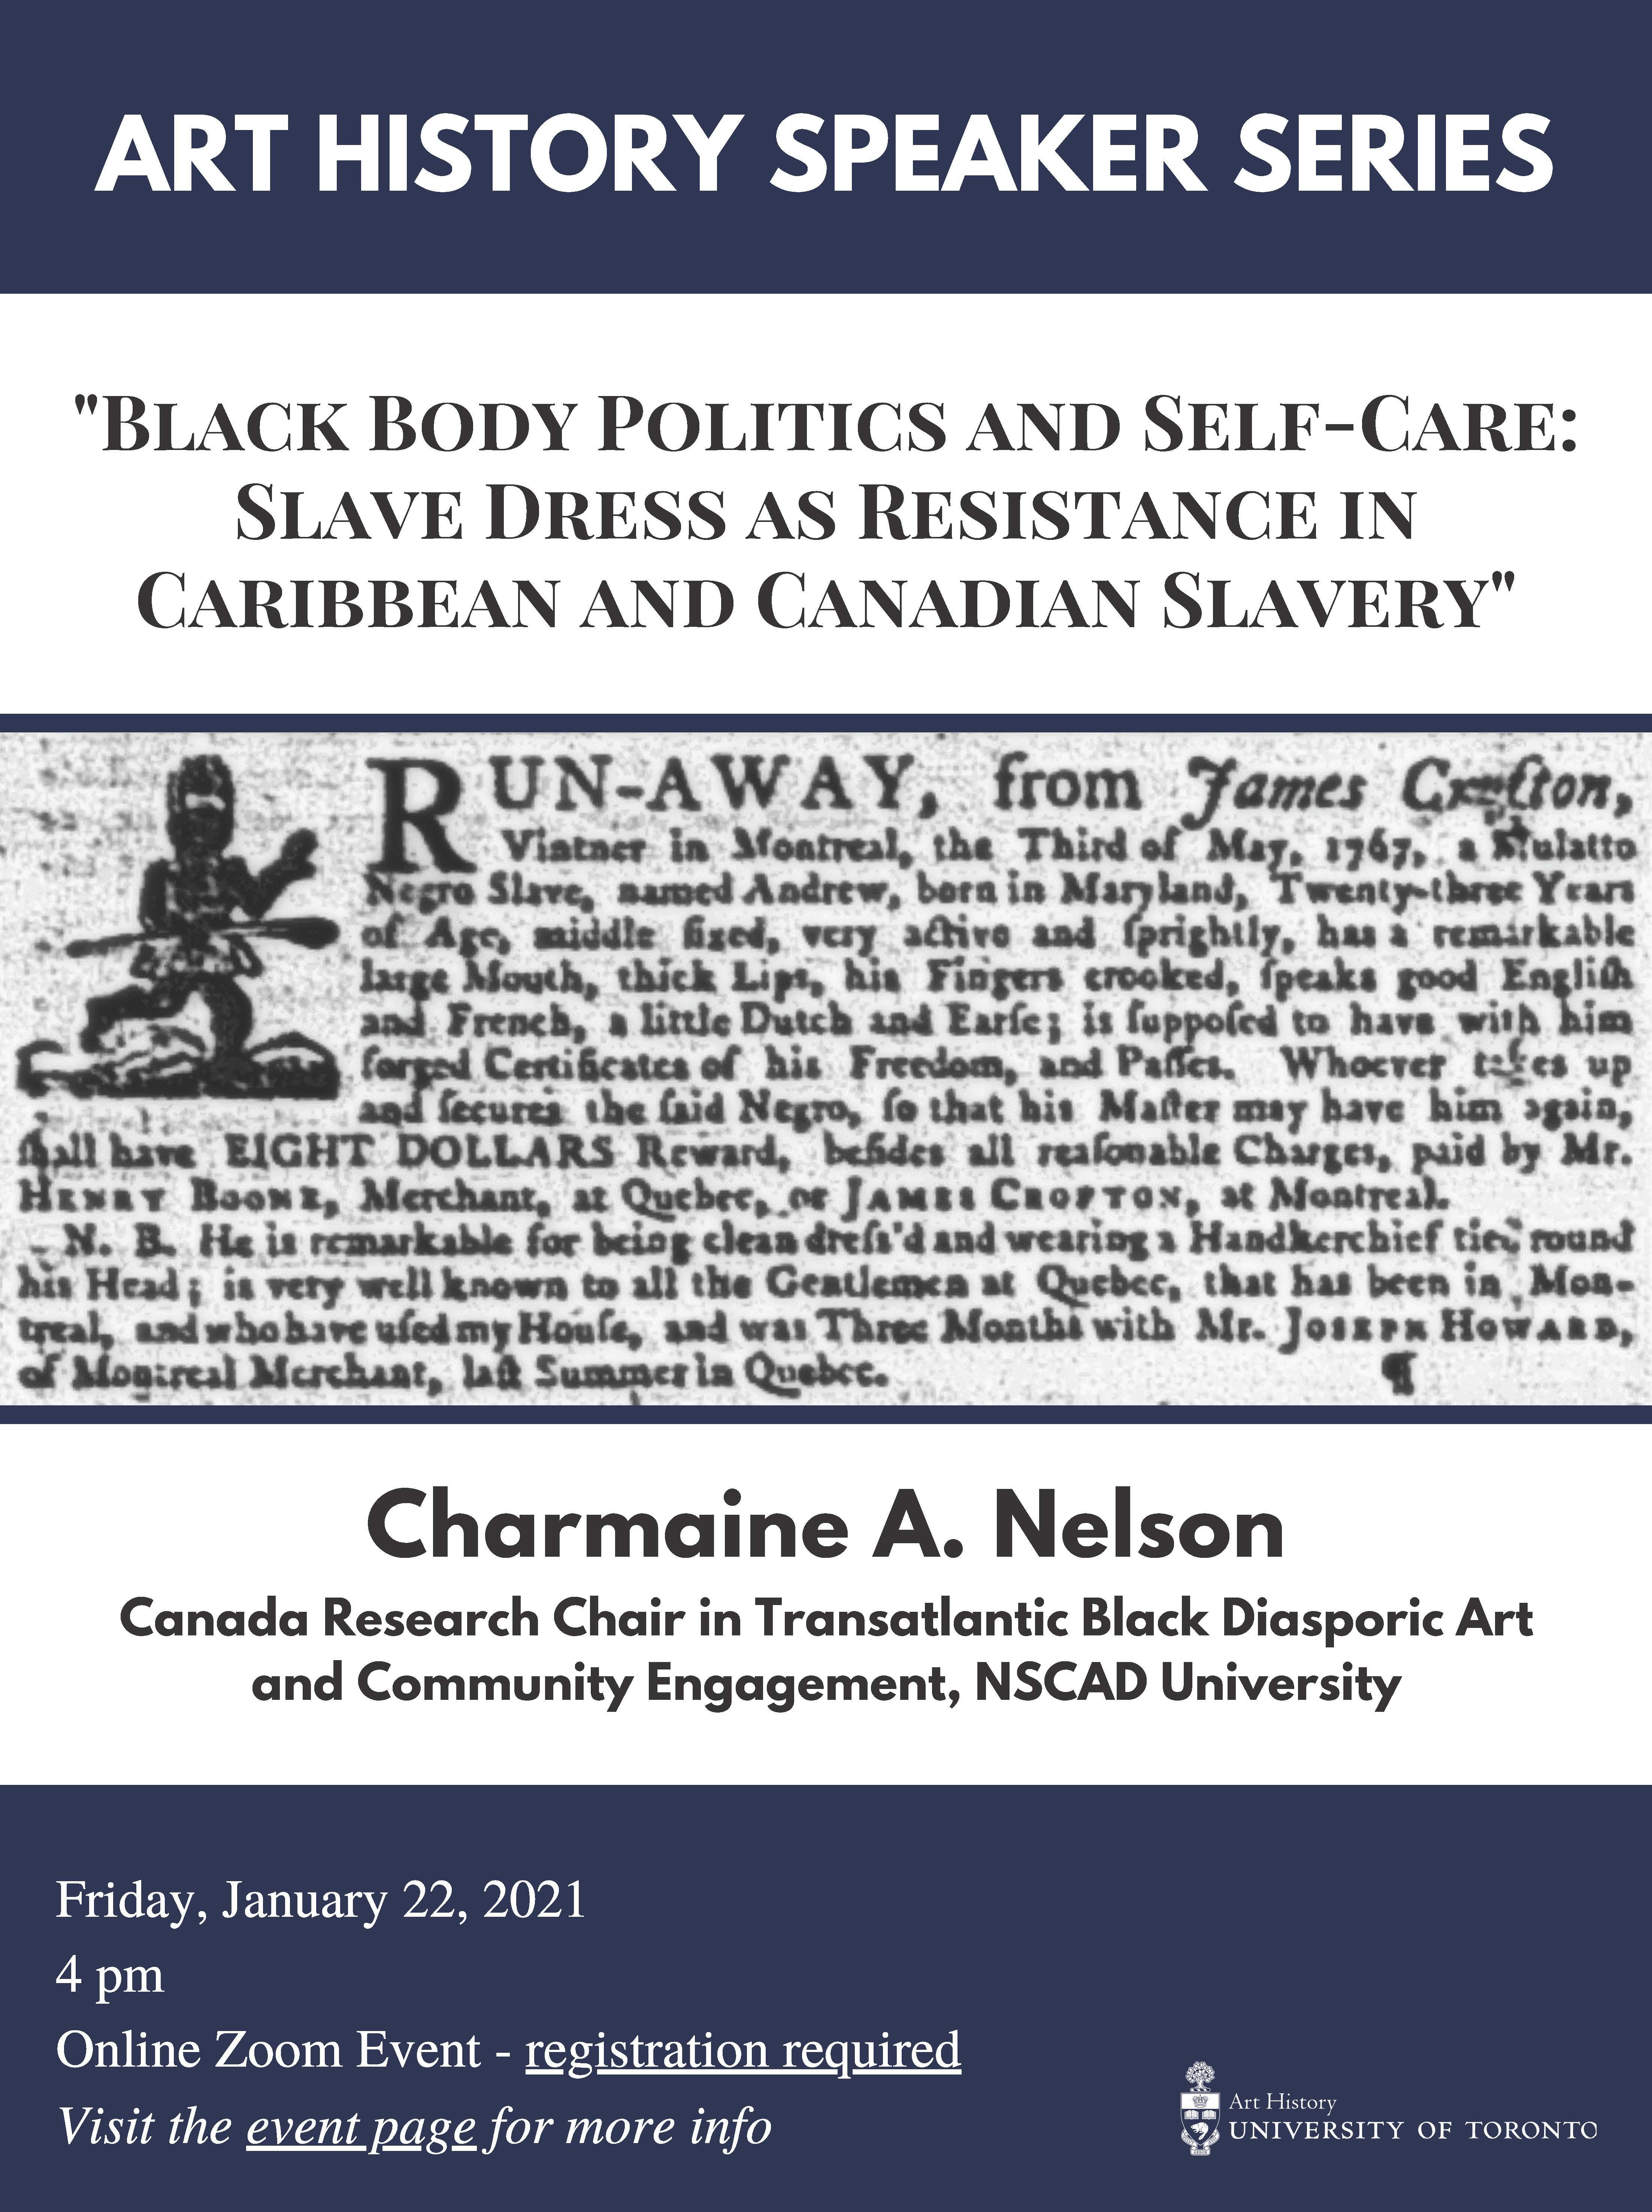 Charmaine A Nelson Art History Speaker Series poster